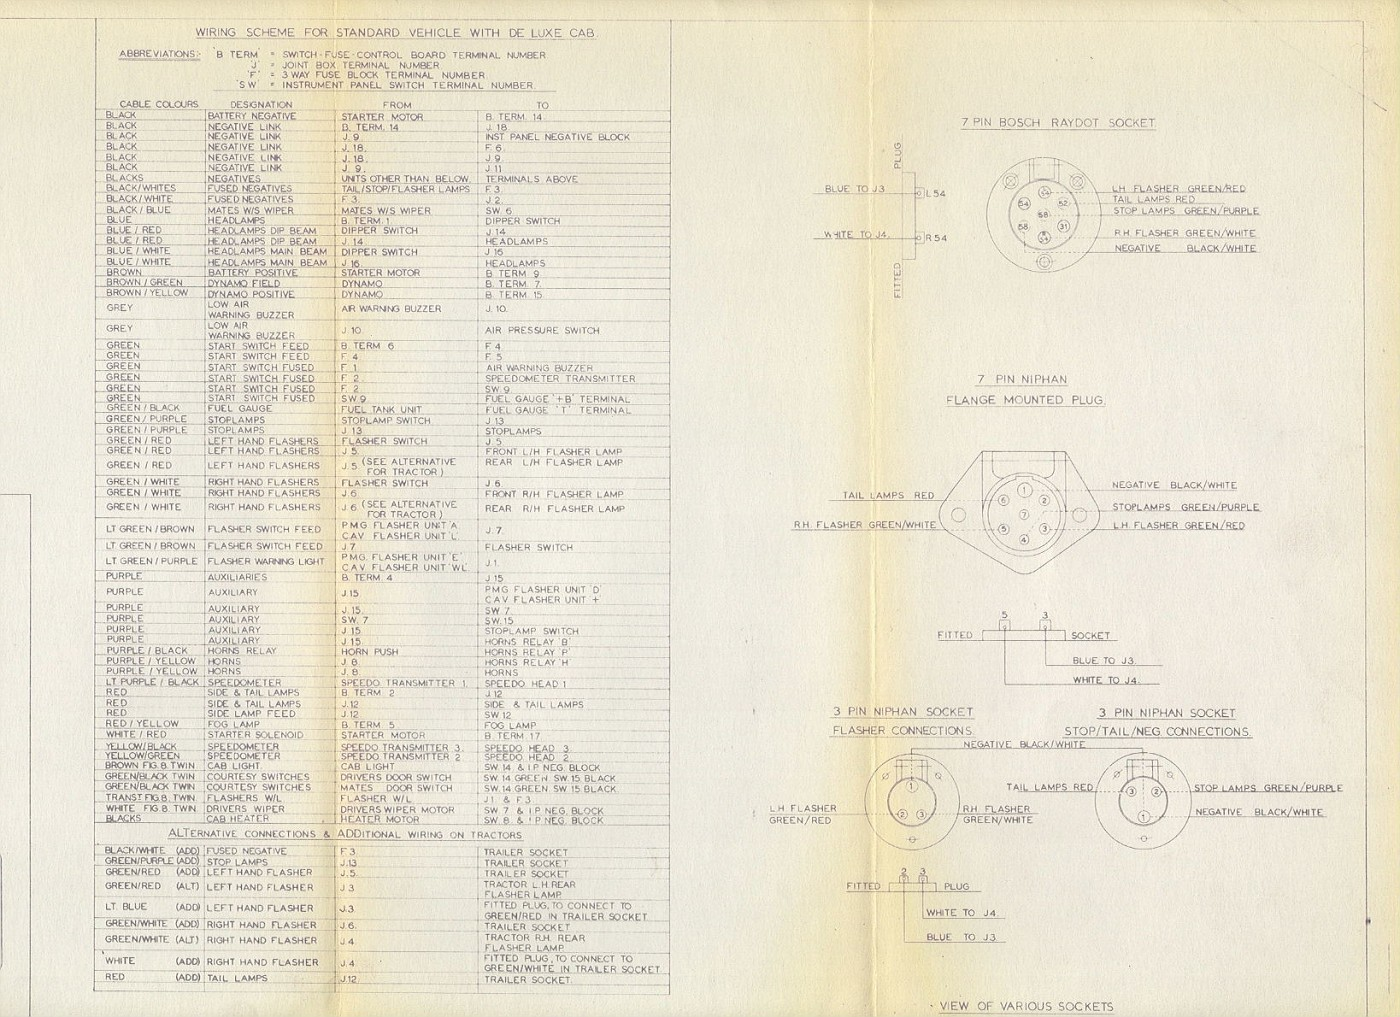 Photo: Atkinson Wiring Diagram p1 | Atkinson-International F4870 (Acco)  album | modeltrucks25modeltrucks25 - Fotki